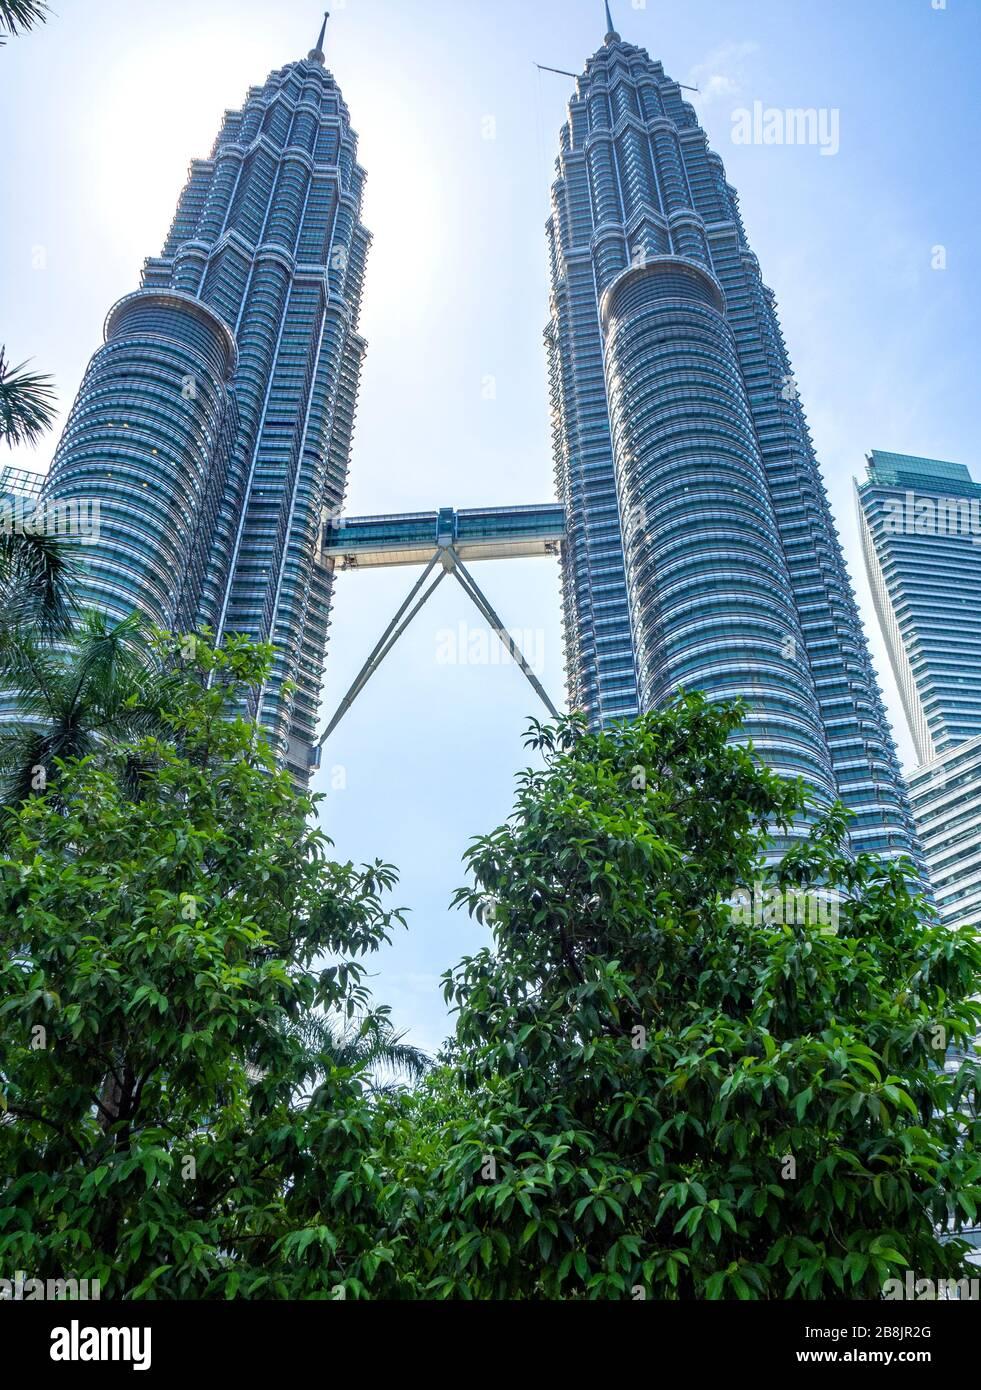 Sky bridge connecting the Petronas Twin Towers Kuala Lumpur Malaysia. Stock Photo